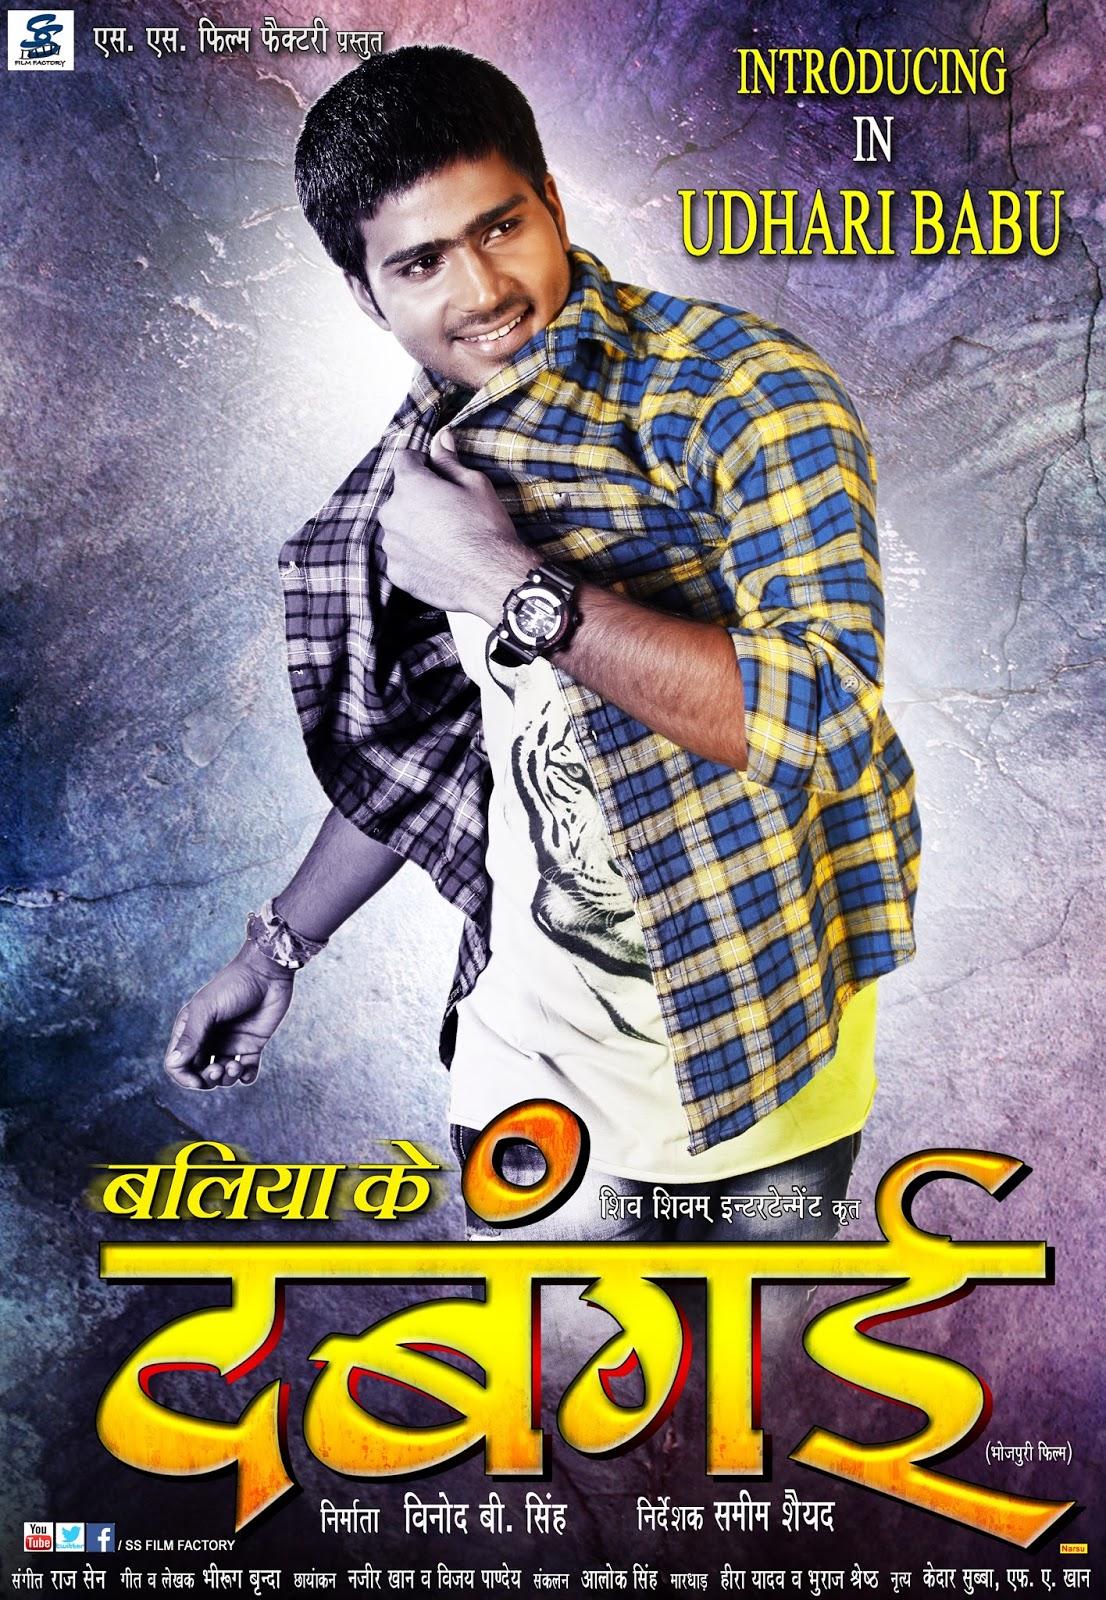 Bhojpuri Movie Ballia Ke Dabangai Trailer video youtube Feat Actor Manoj R. Pandey actress Anjani Singh, Priya Sharma, Priti Singhaniya, Anjana Singh, Seema Singh first look poster, movie wallpaper